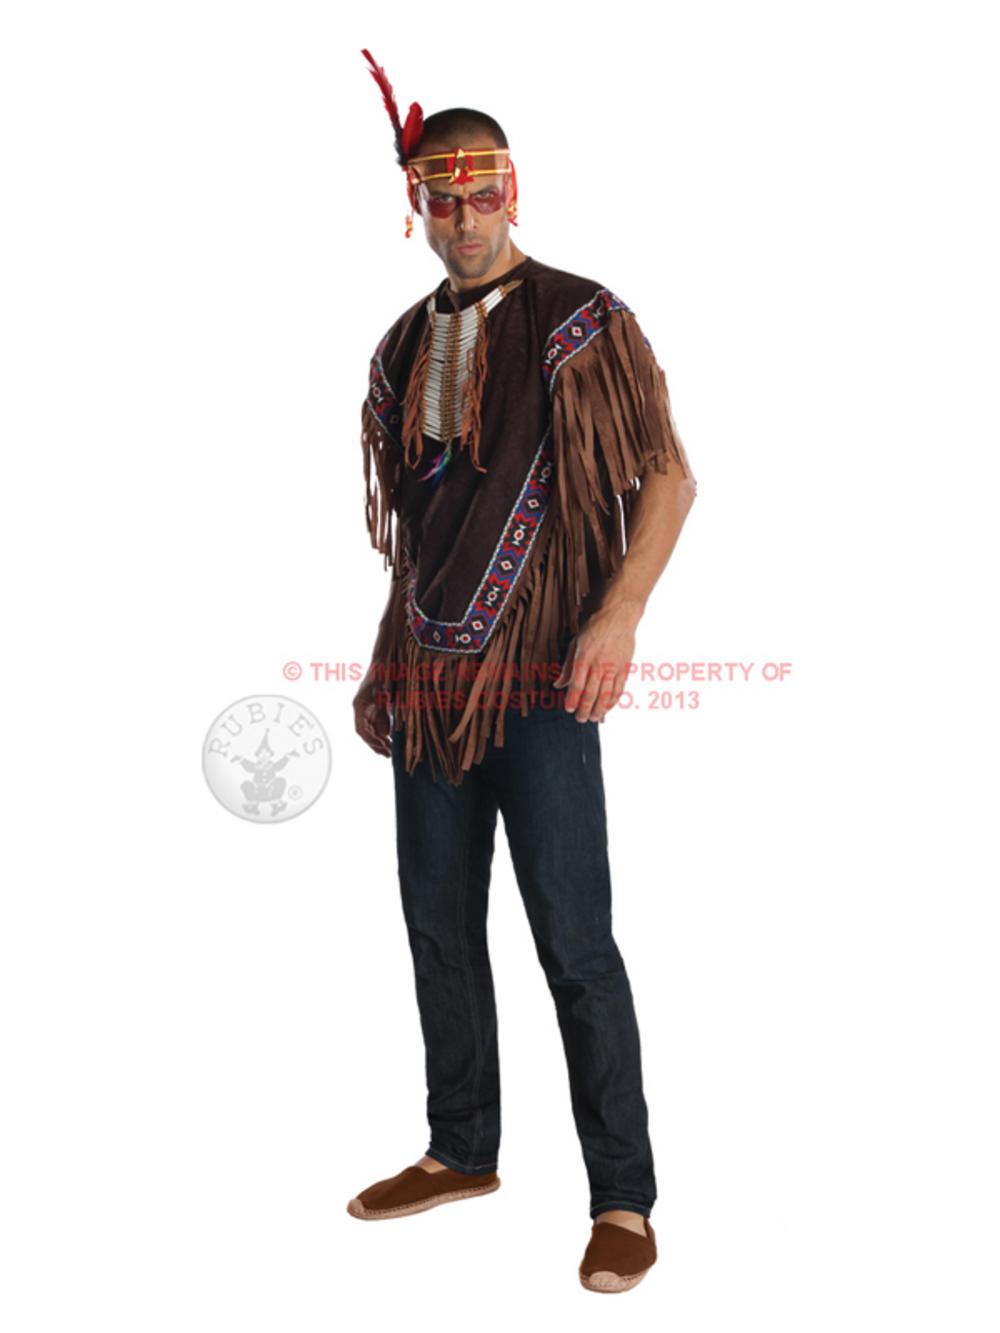 rodeo hindu single men Jeff shear, bob marriott & matt twitchell for sale: pickup horse, team roping horse, bull dragging, roping ranch horse.